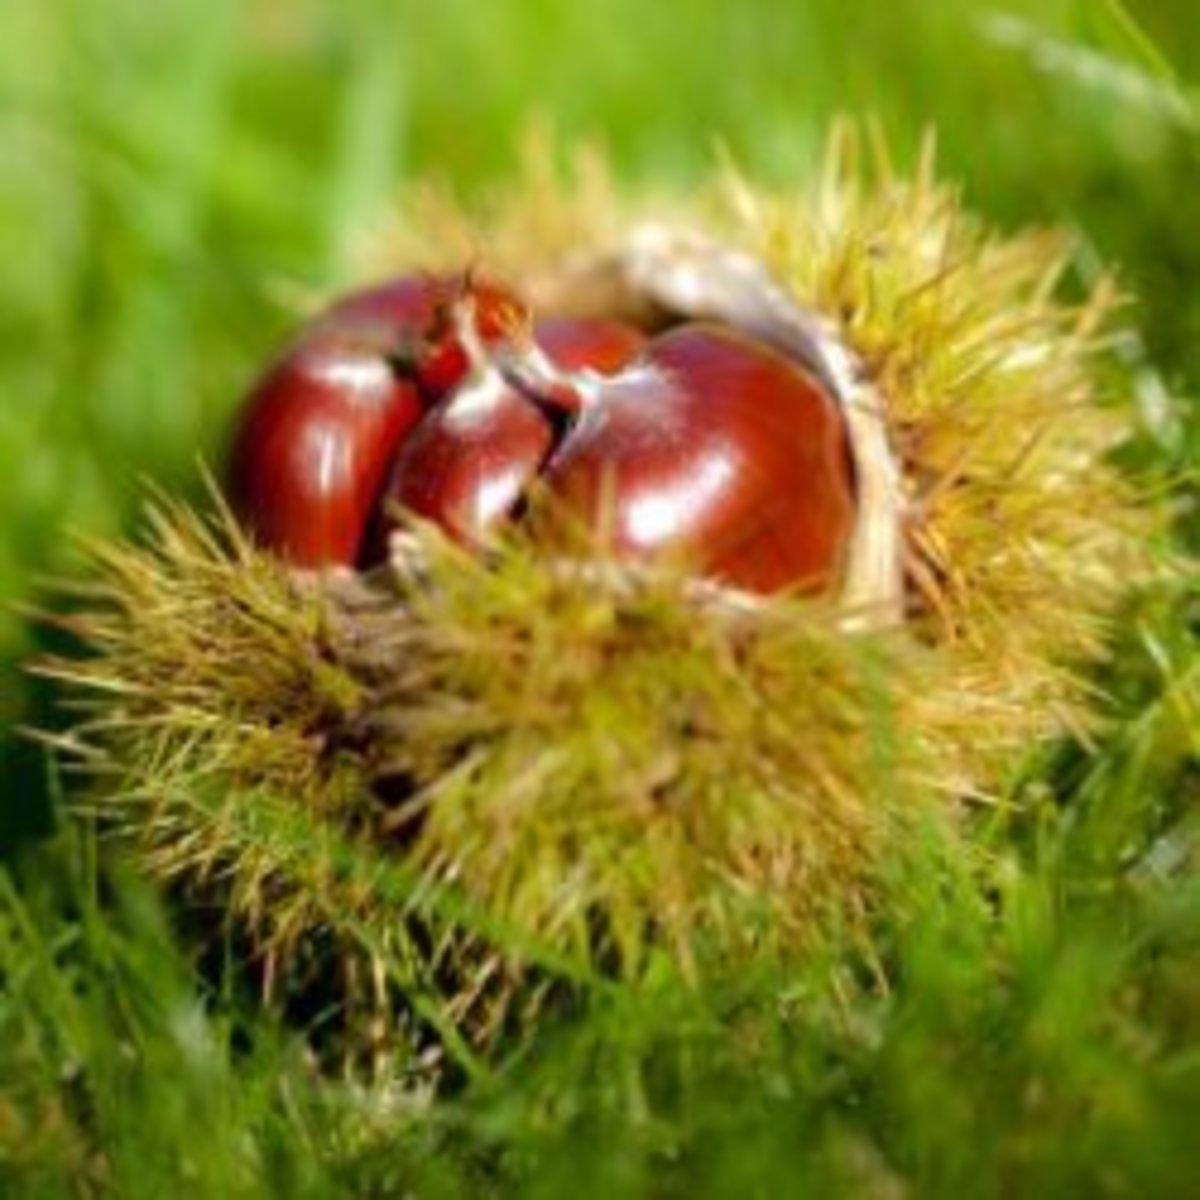 Chestnuts in their case